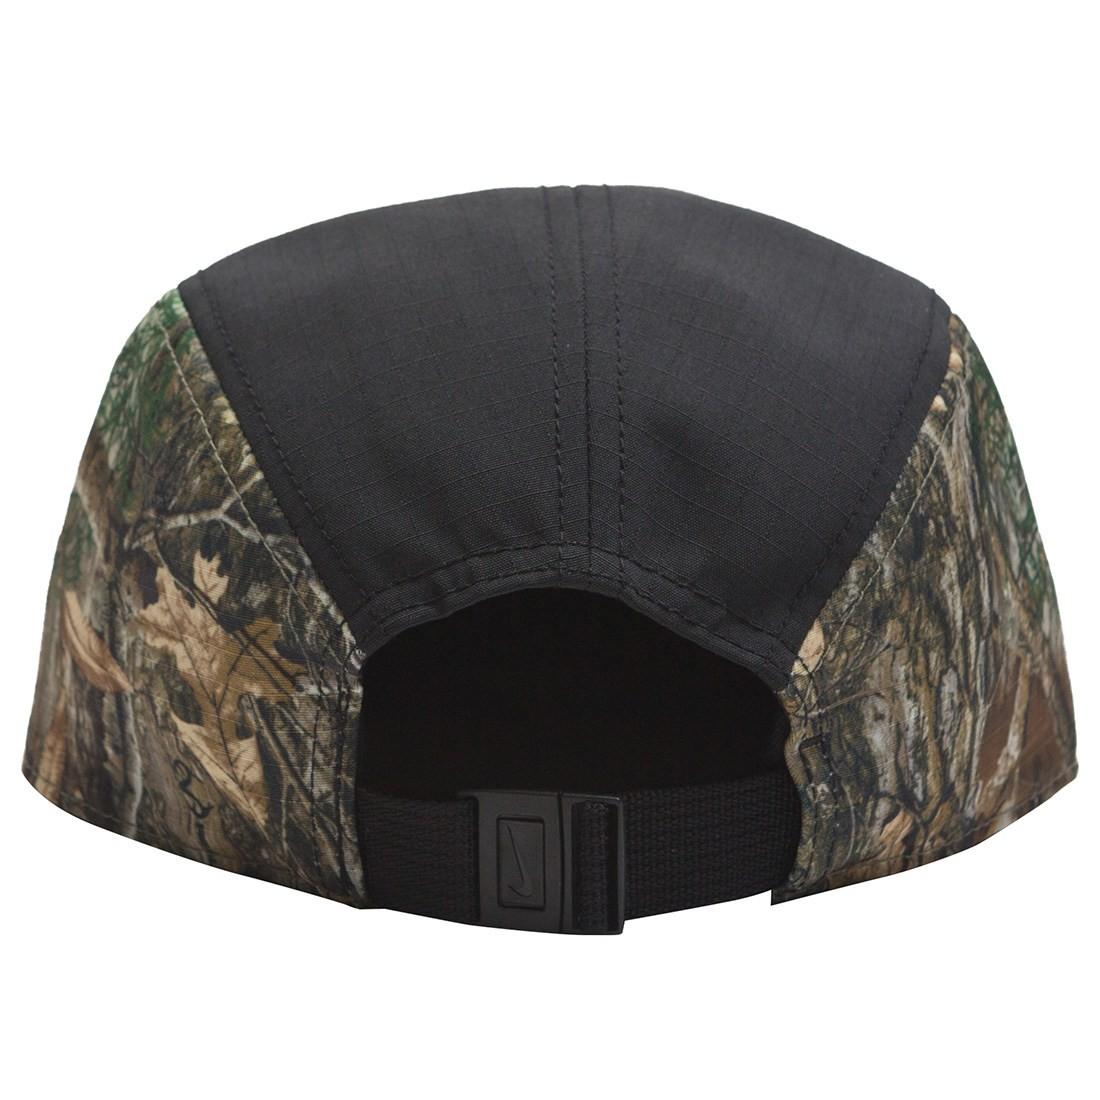 944eef0f08a Nike Men Nrg Sportswear Aw84 Rlt Realtree Adjustable Cap (black / white)